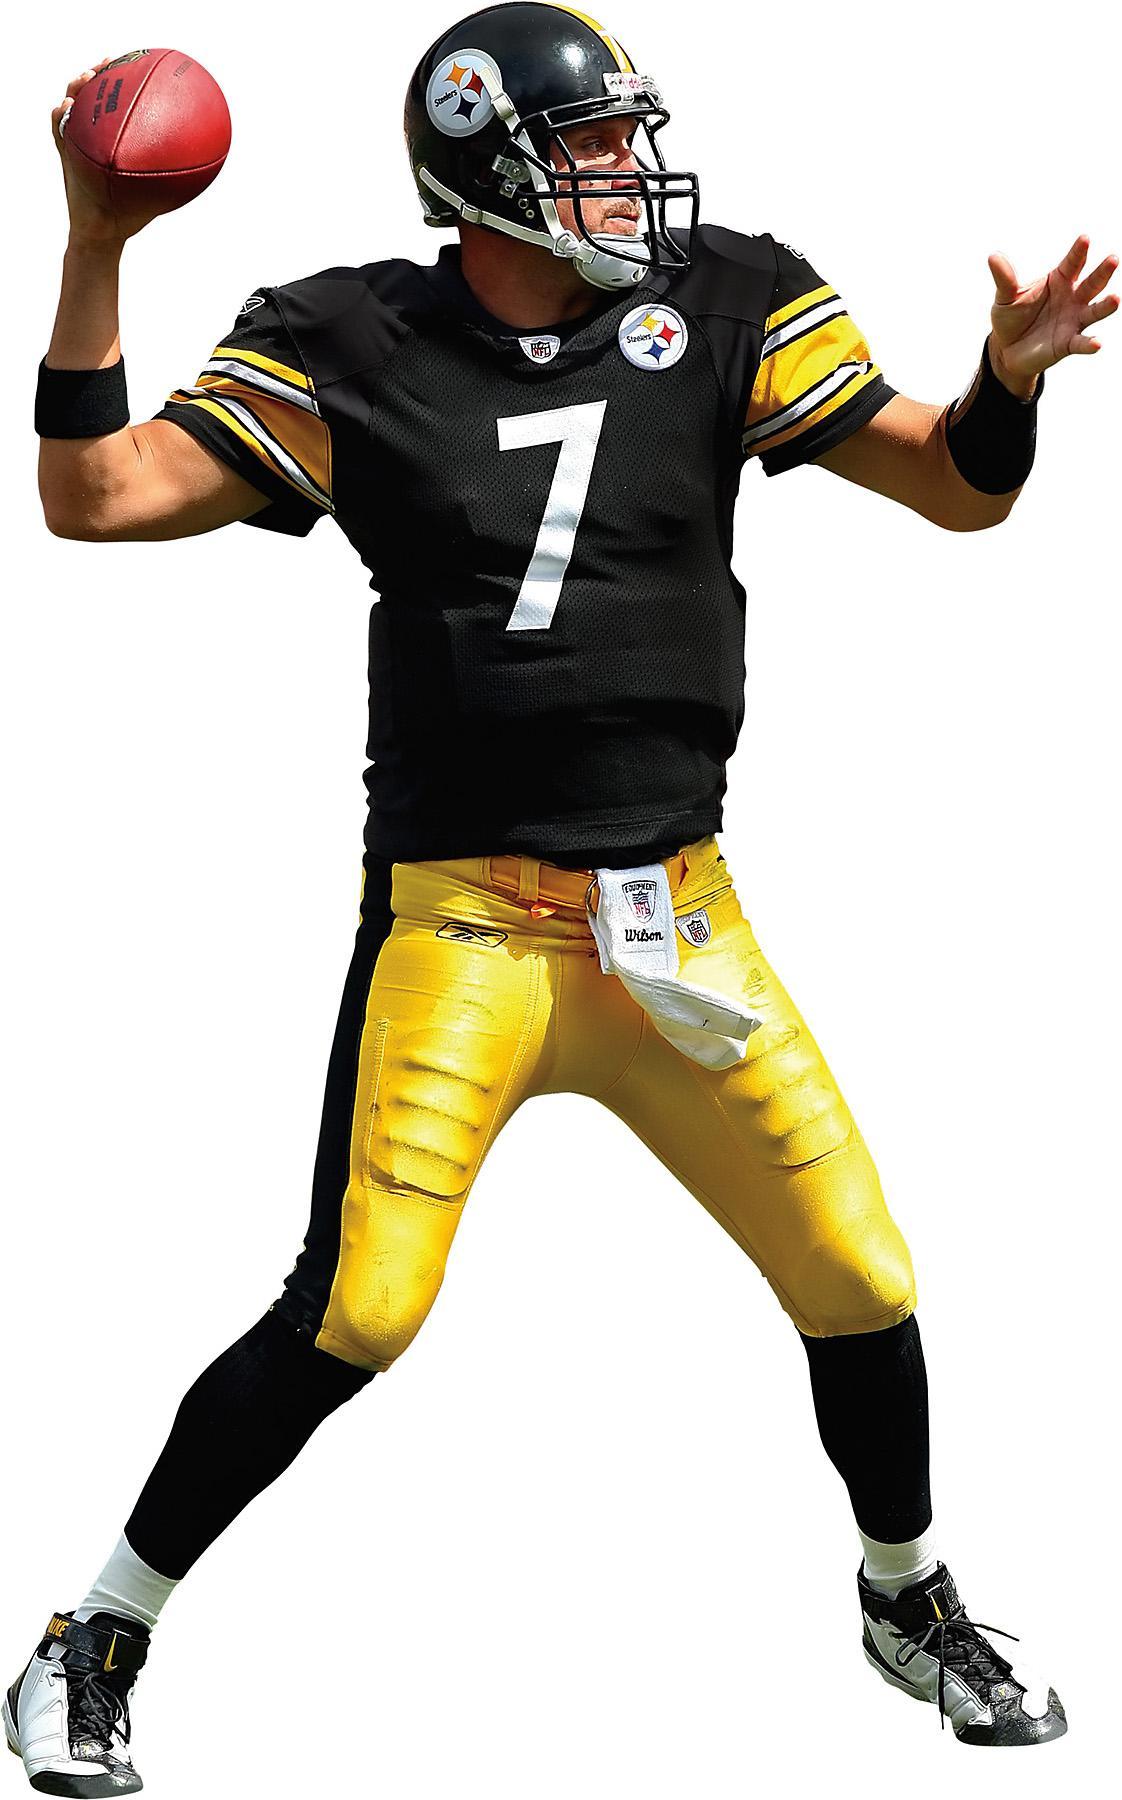 1122x1800 Brewster Wallpaper Pittsburgh Steelers Ben Roethlisberger Fathead